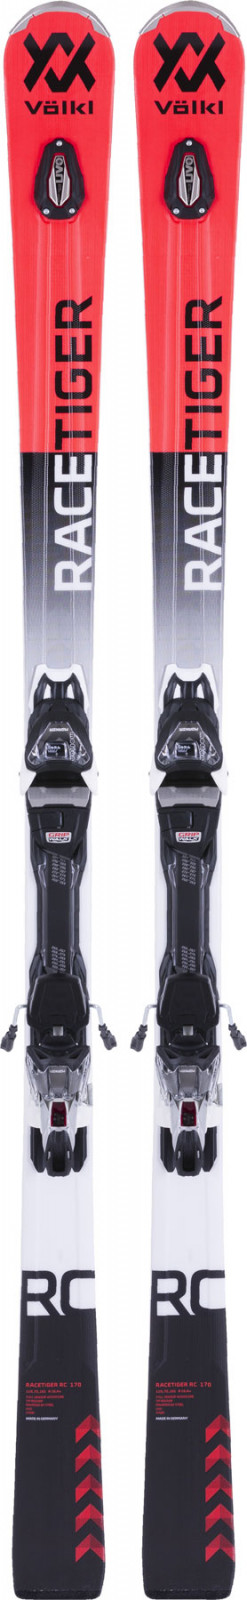 Völkl Racetiger RC Red + vMotion 10 GW